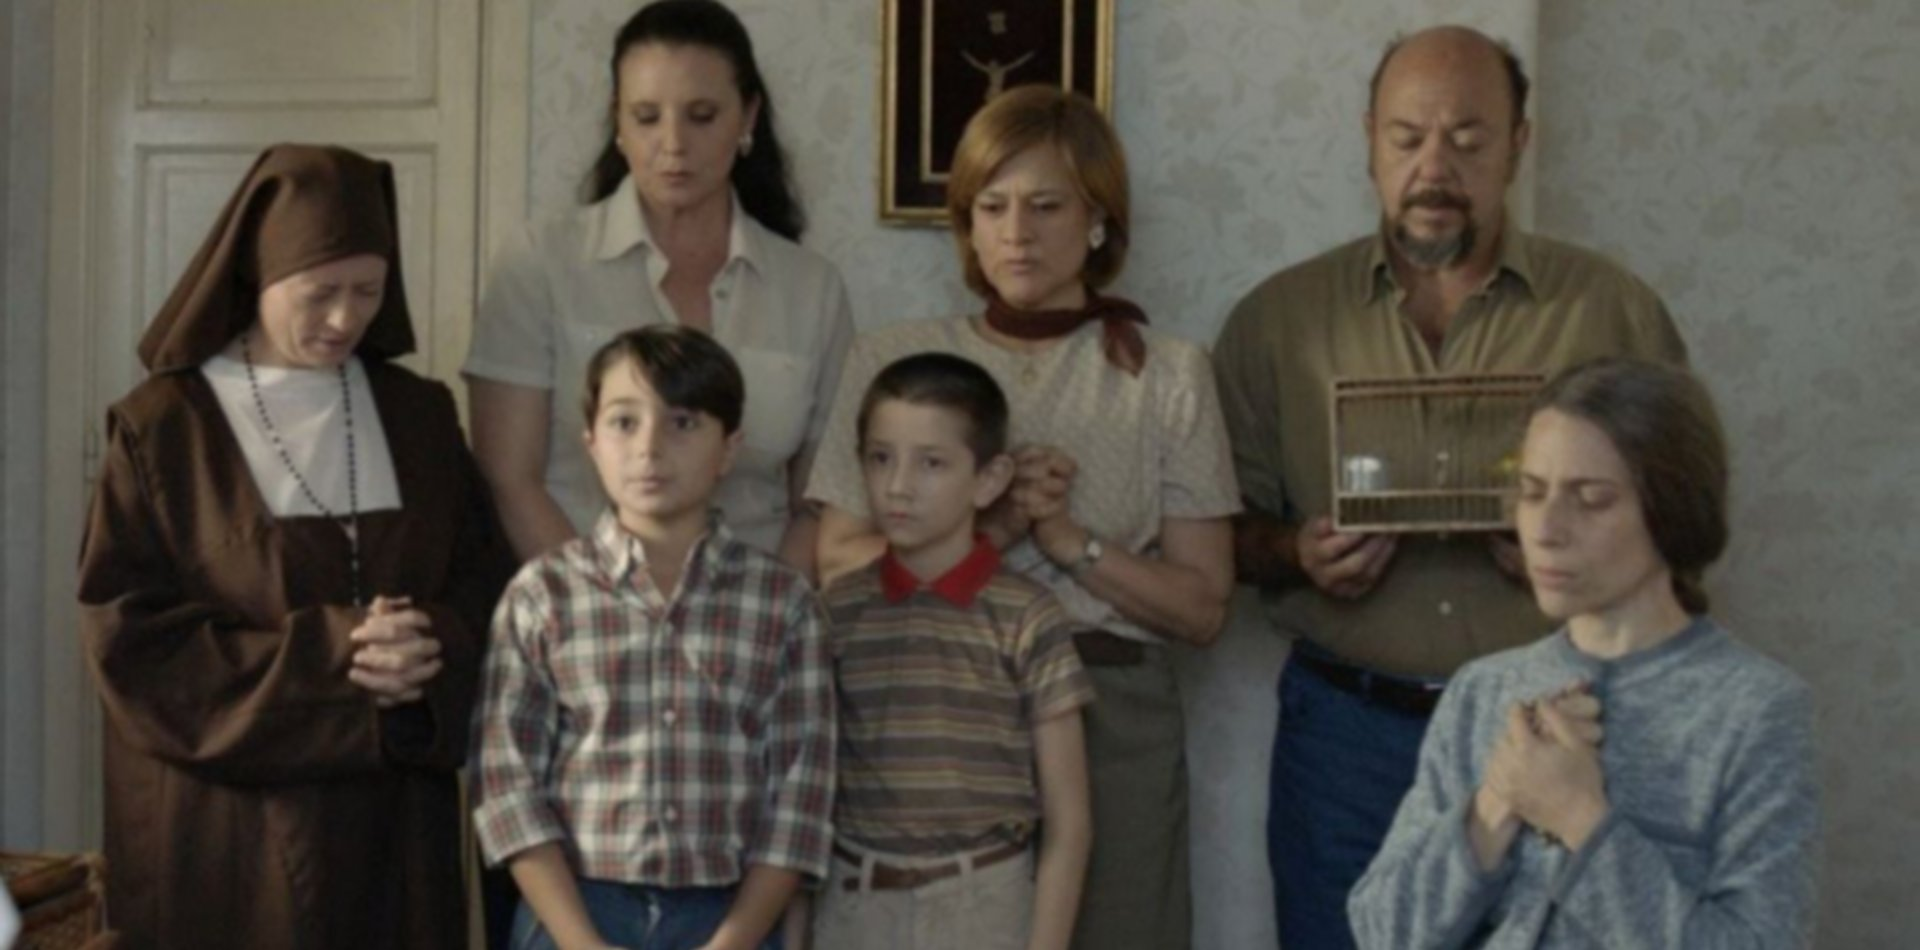 """1986"", el thriller sobrenatural que se grabó en La Plata y se estrenó en plena pandemia"